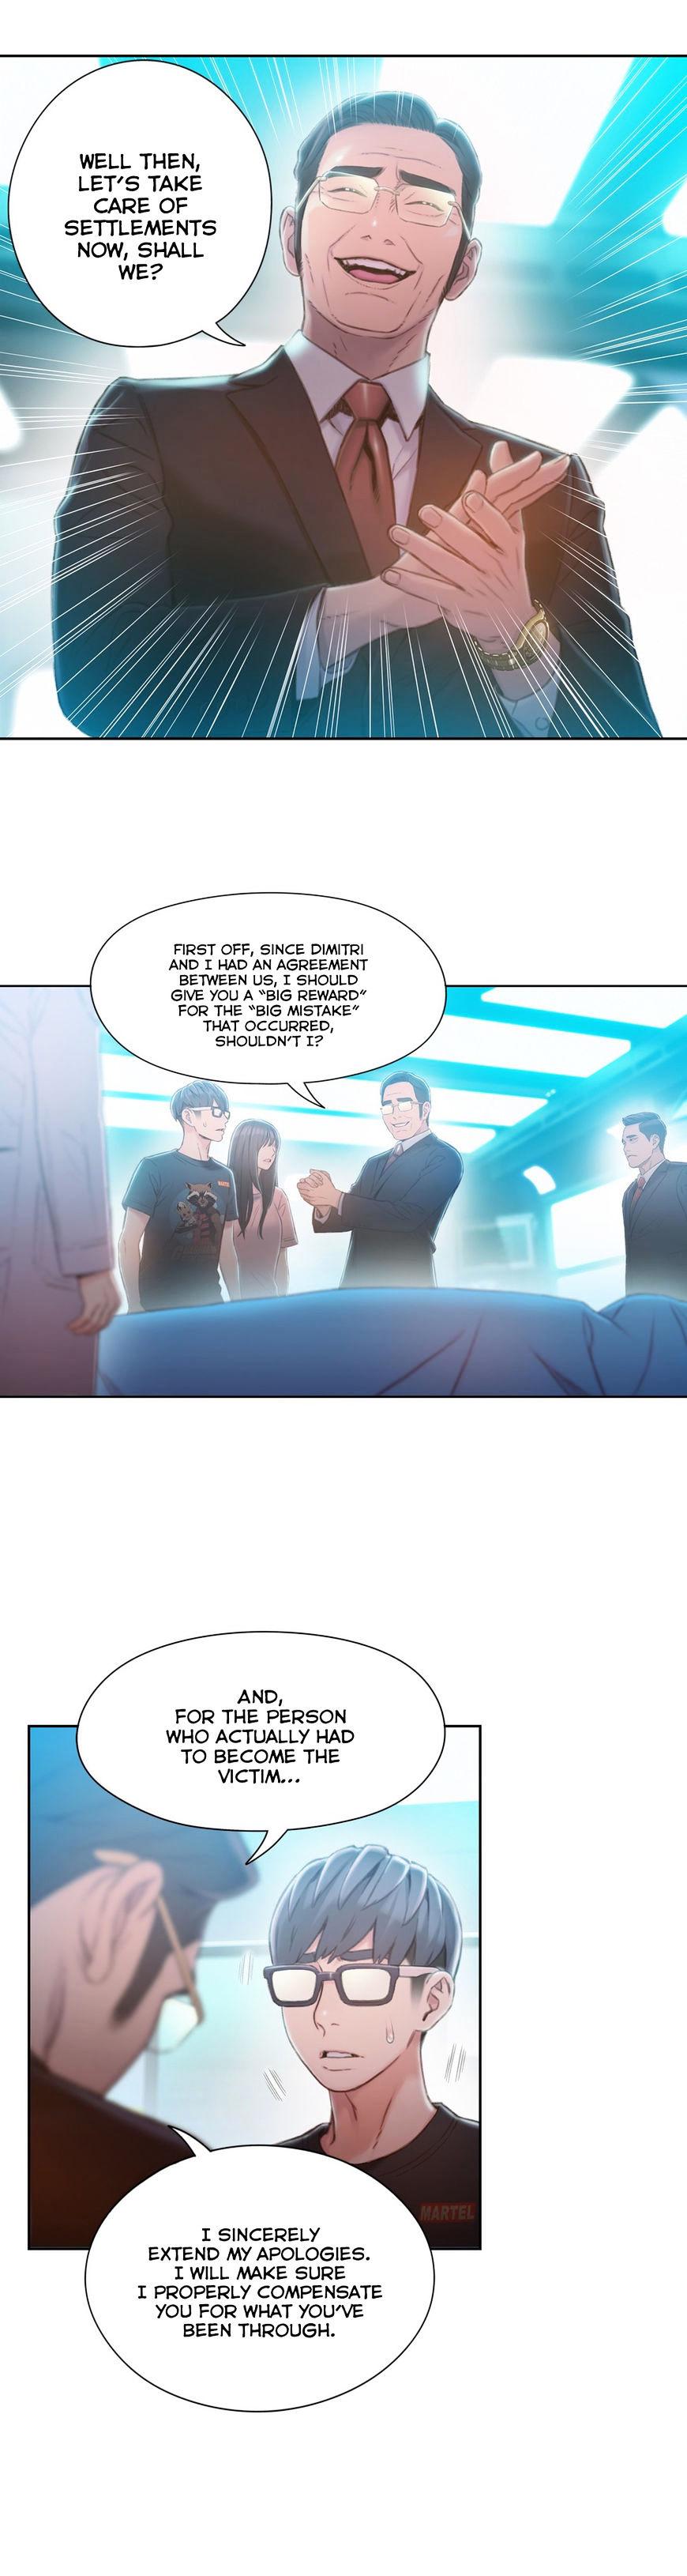 Sweet Guy Chapter 73 Full Manga Read Scan Image 12